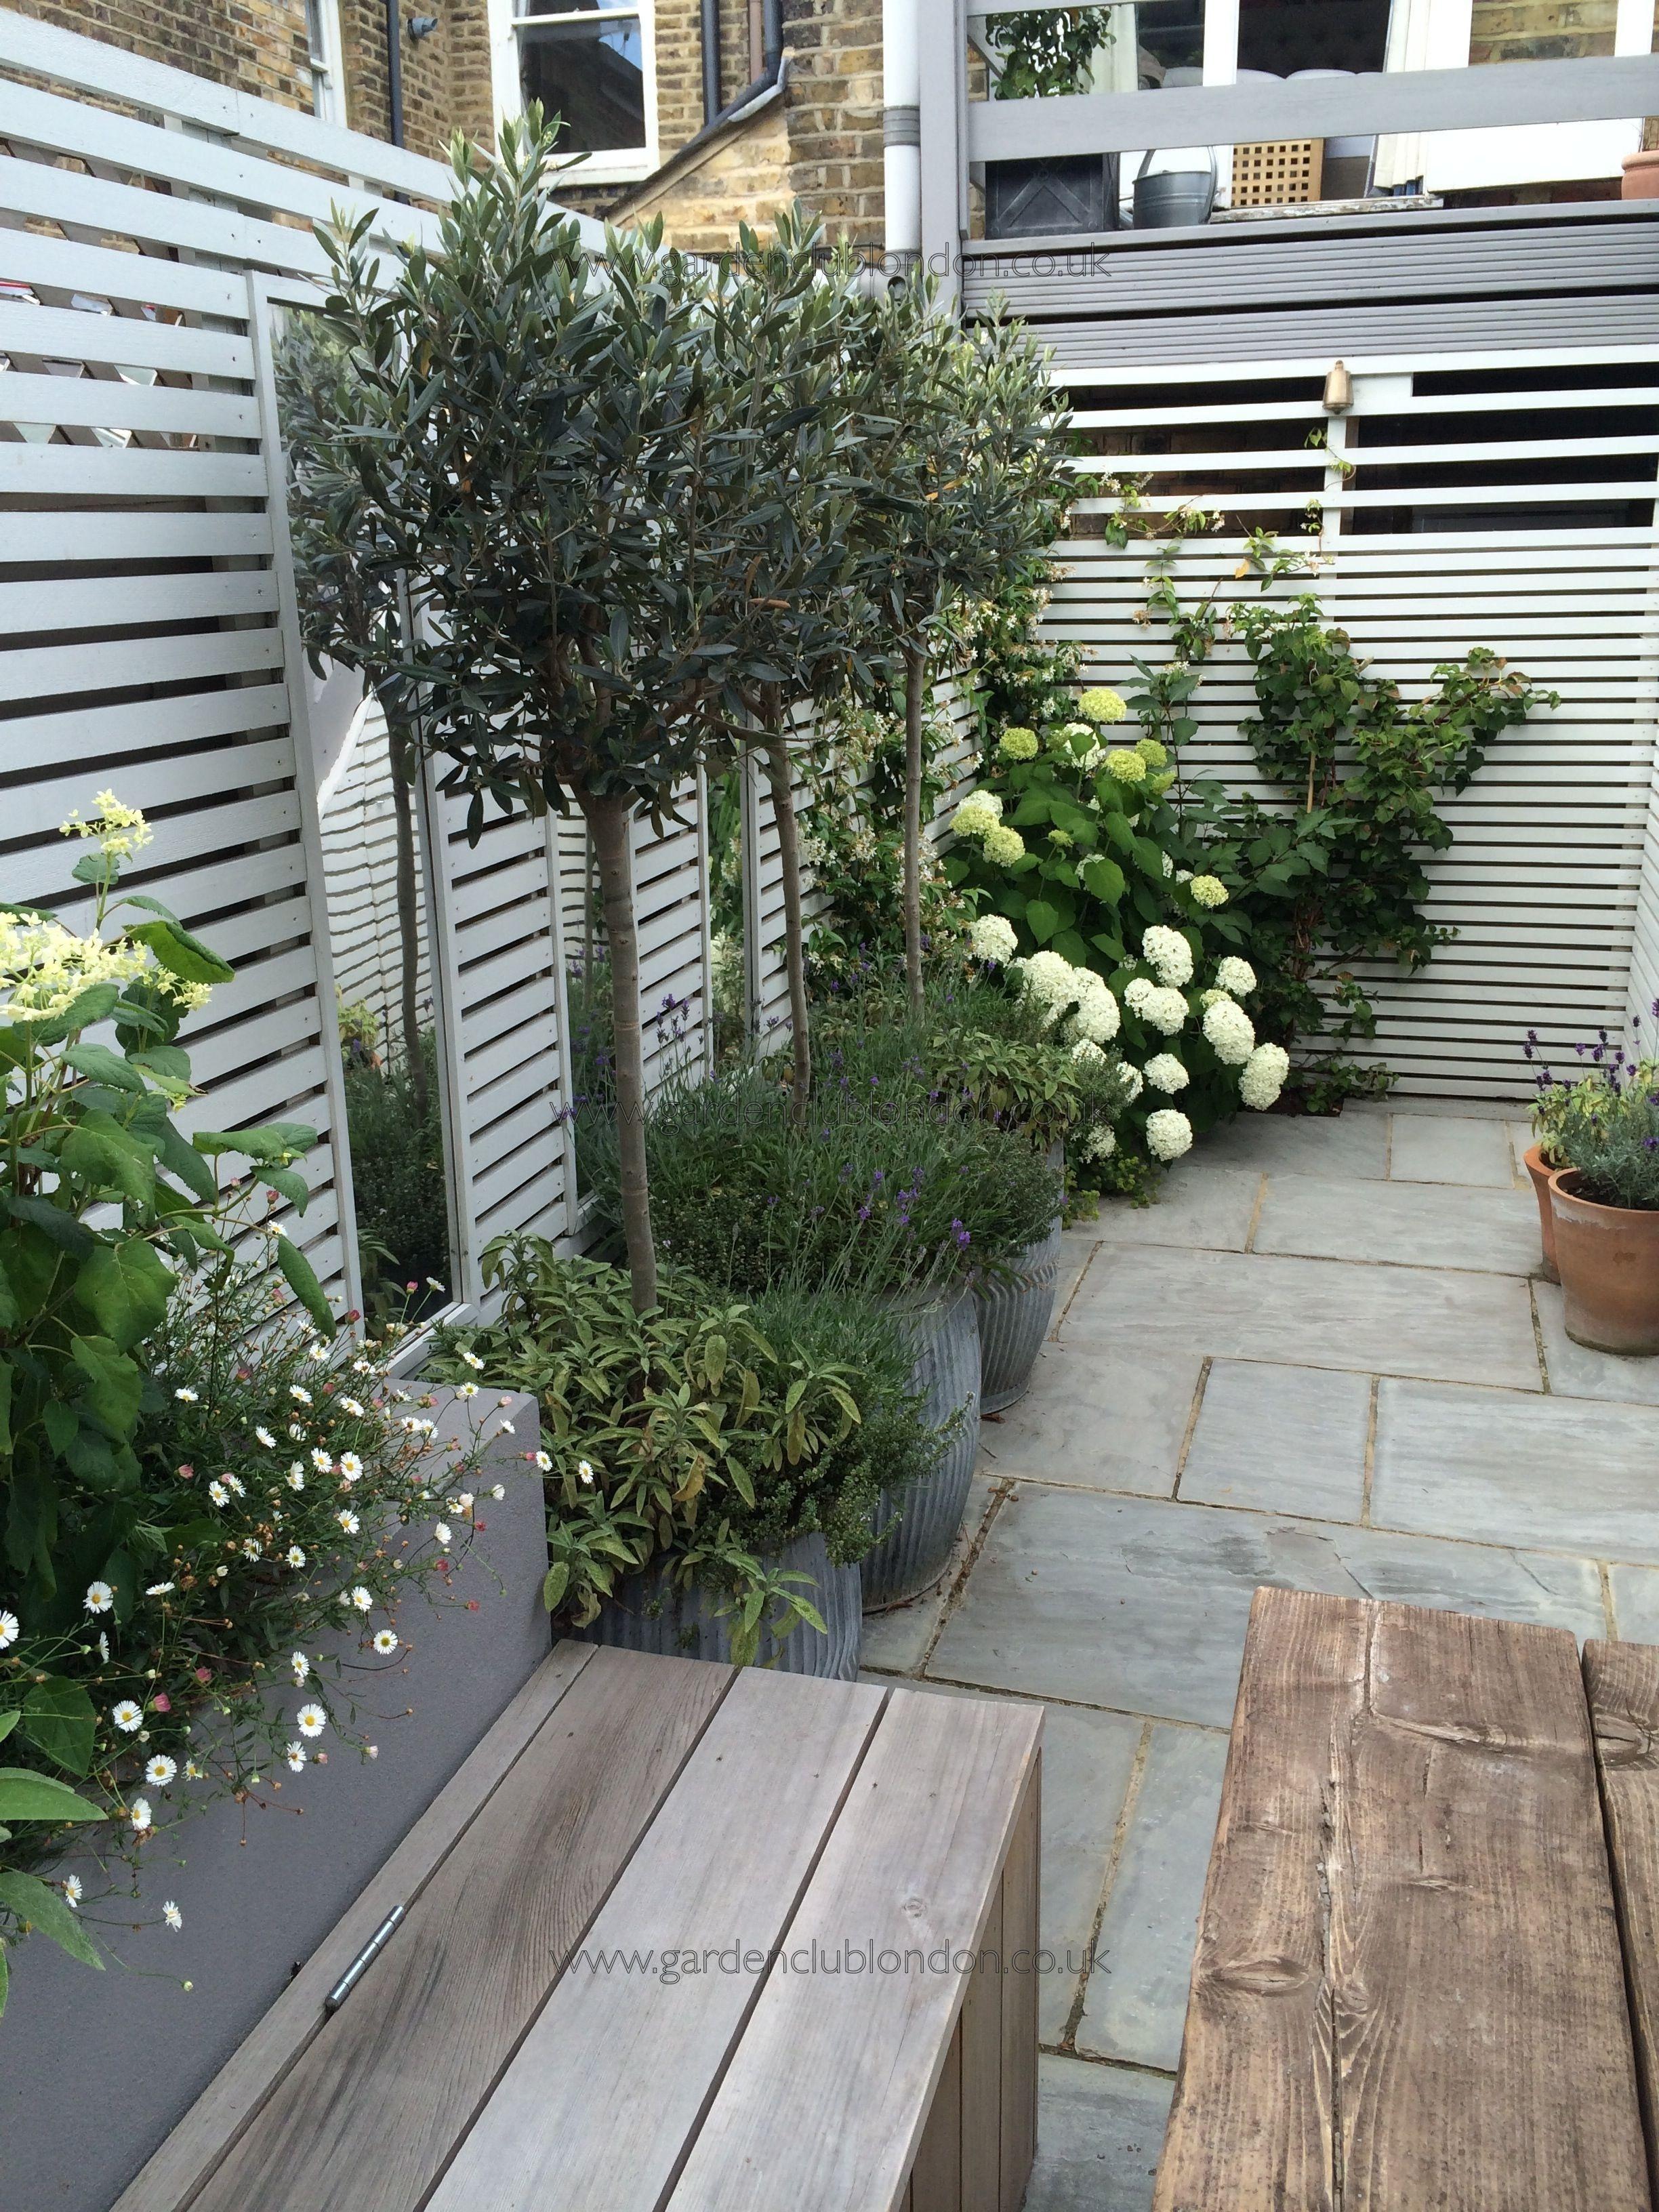 Backyard Concert Beautiful Private Small Garden Design ... on Small Urban Patio Ideas id=67535